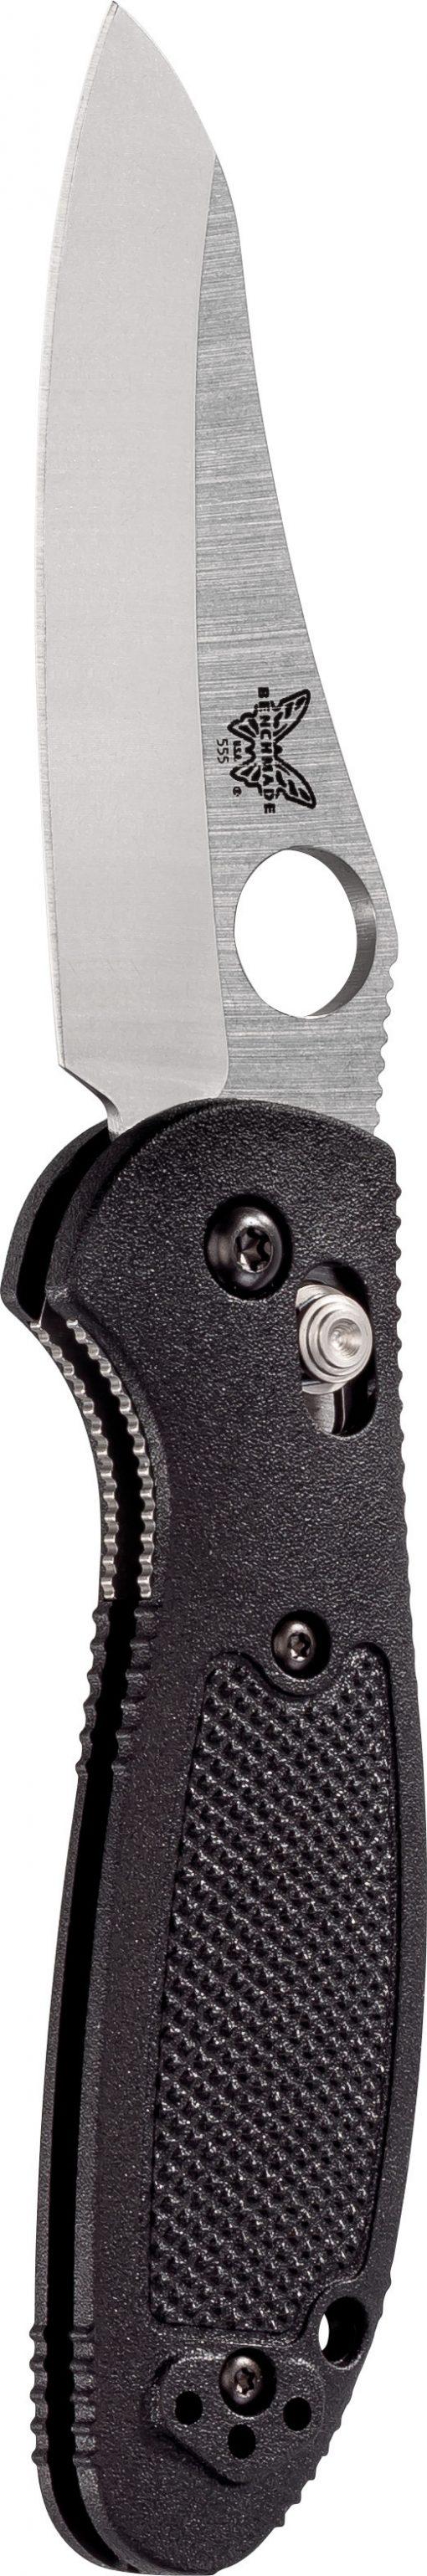 Benchmade Mini Griptilian S30V Blade Black Nylon Handle Front Side Open Up